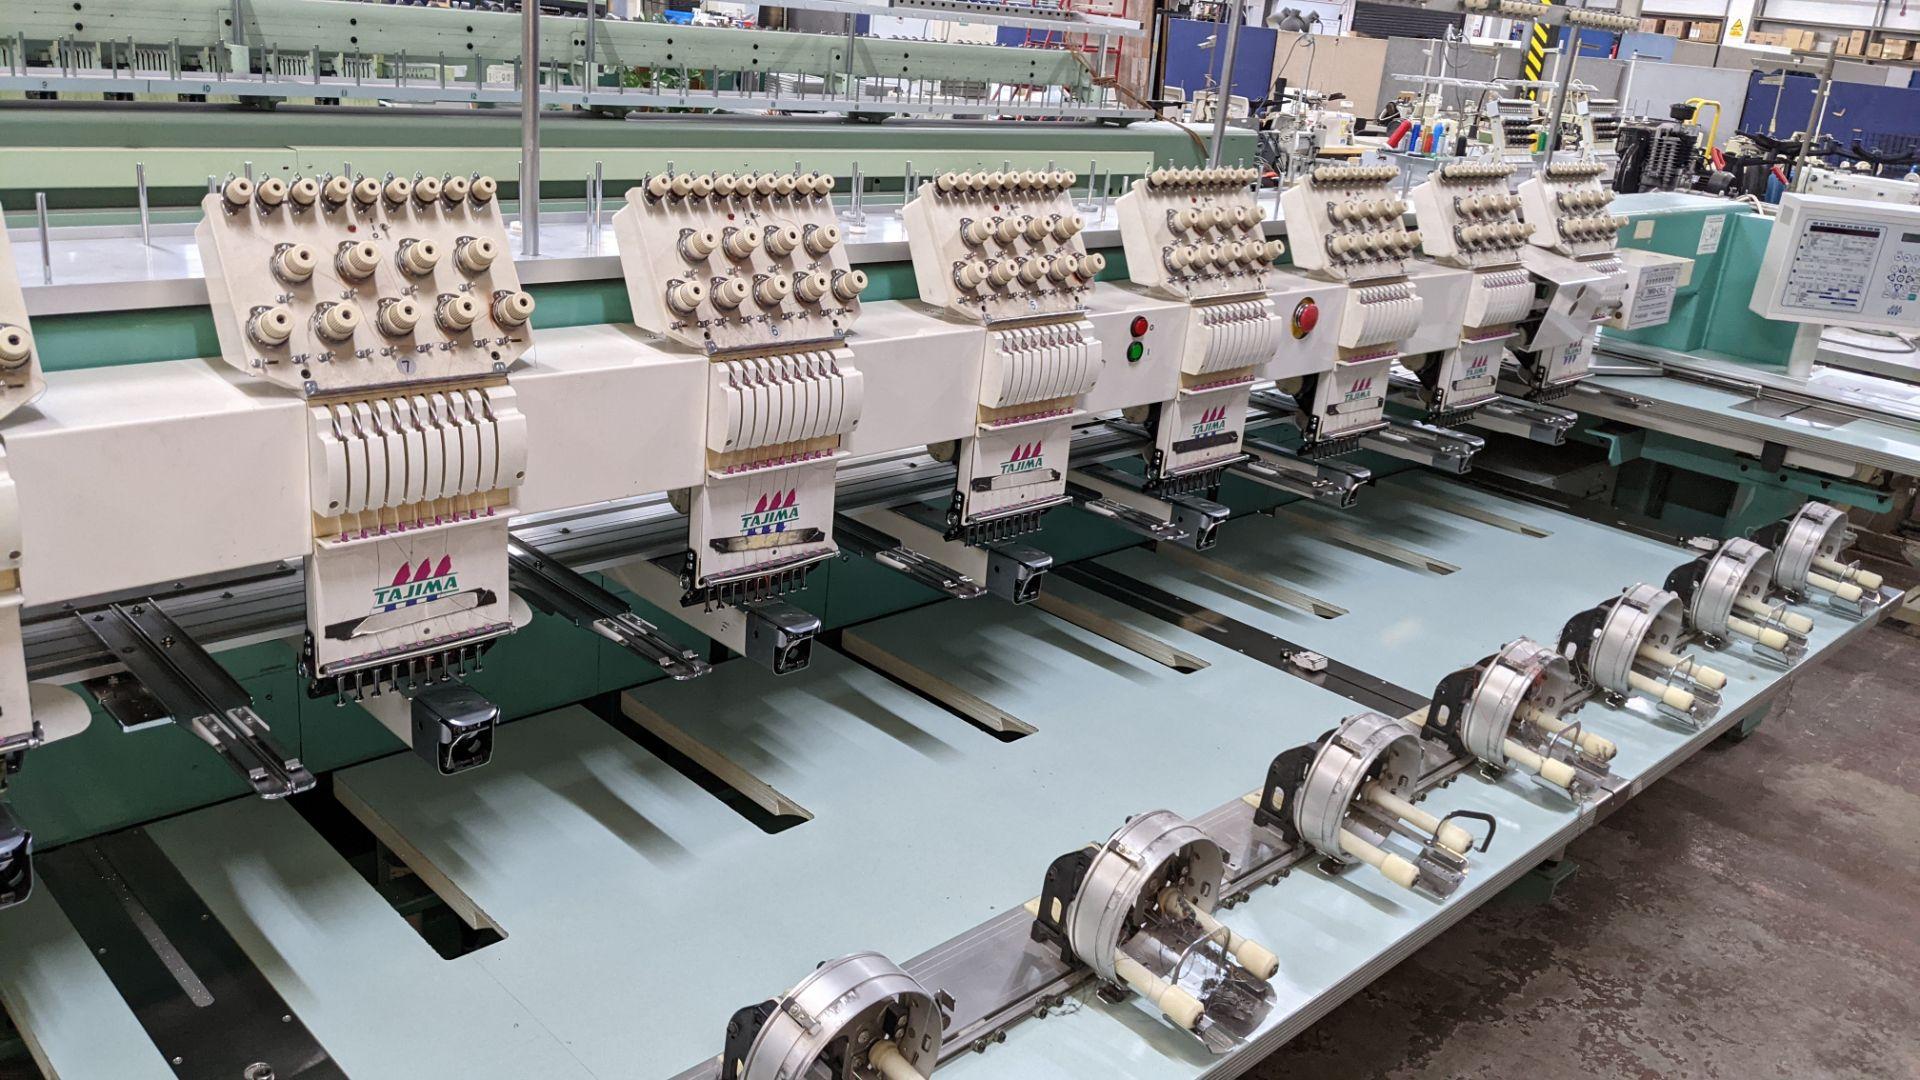 Tokai Tajima model TMFD-C912 electronic 12 head embroidery machine, type 2-2FX - Image 6 of 27